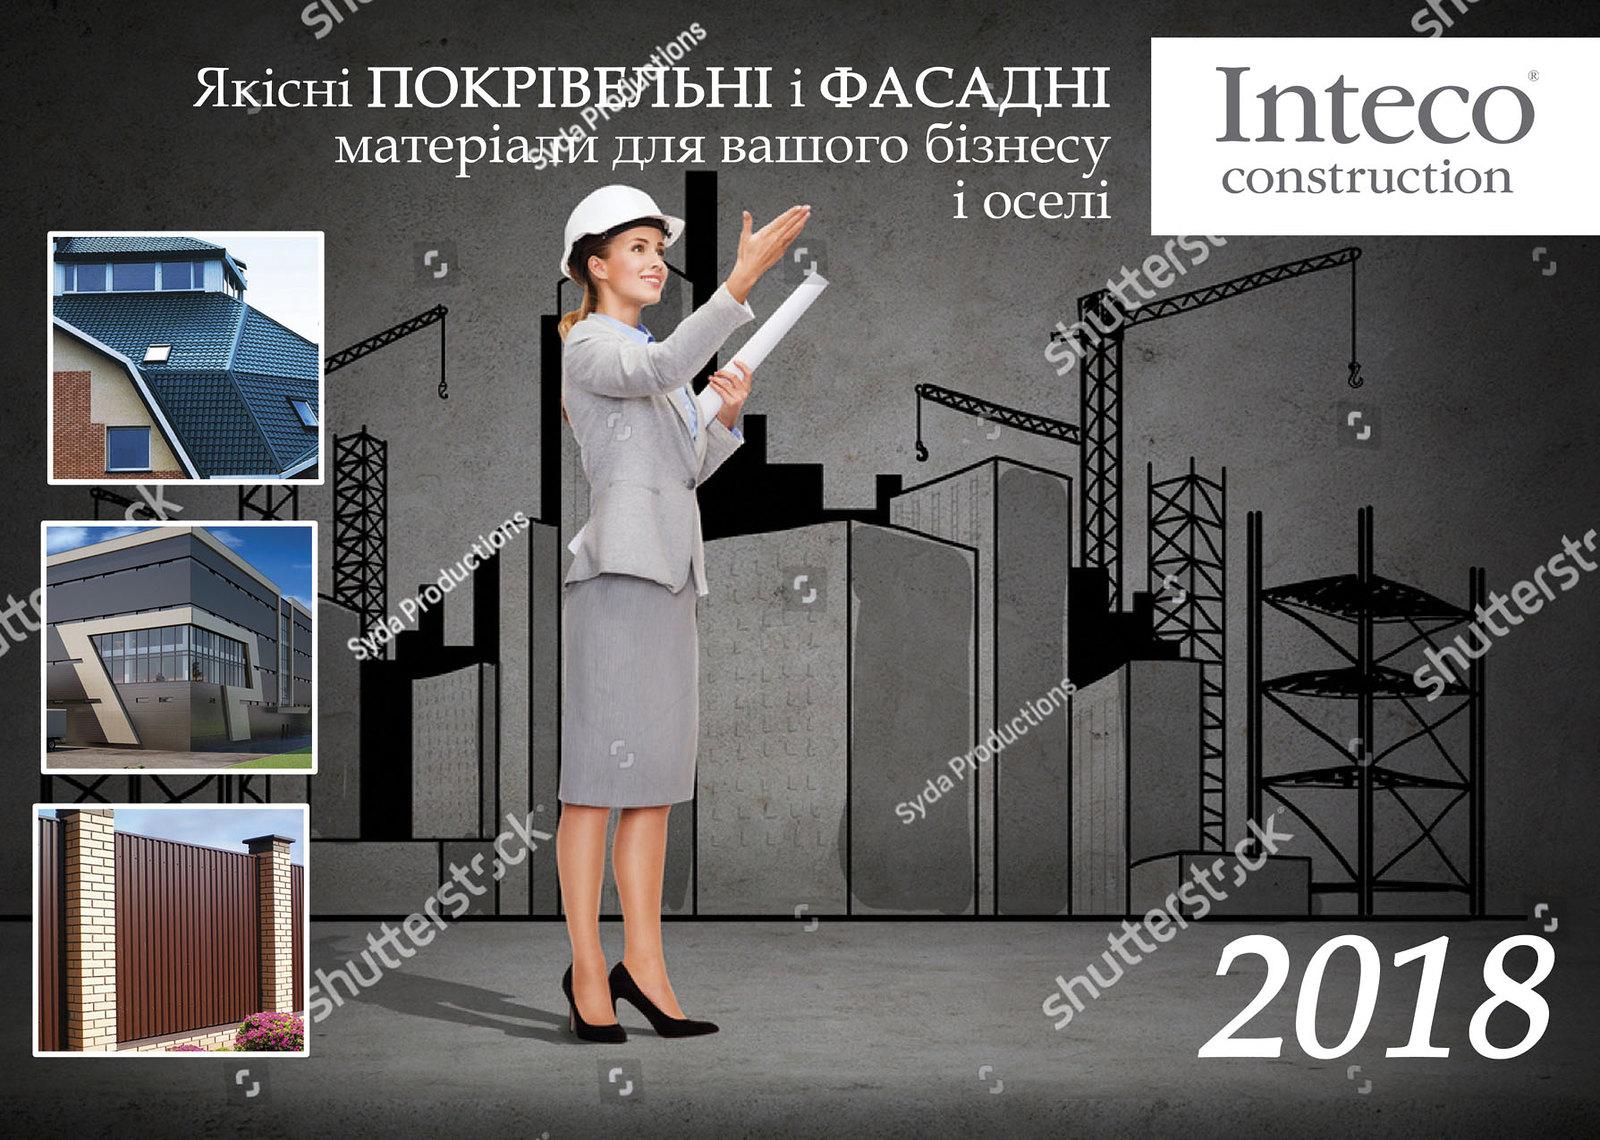 (01) Kalend Inteco 01 verh 11